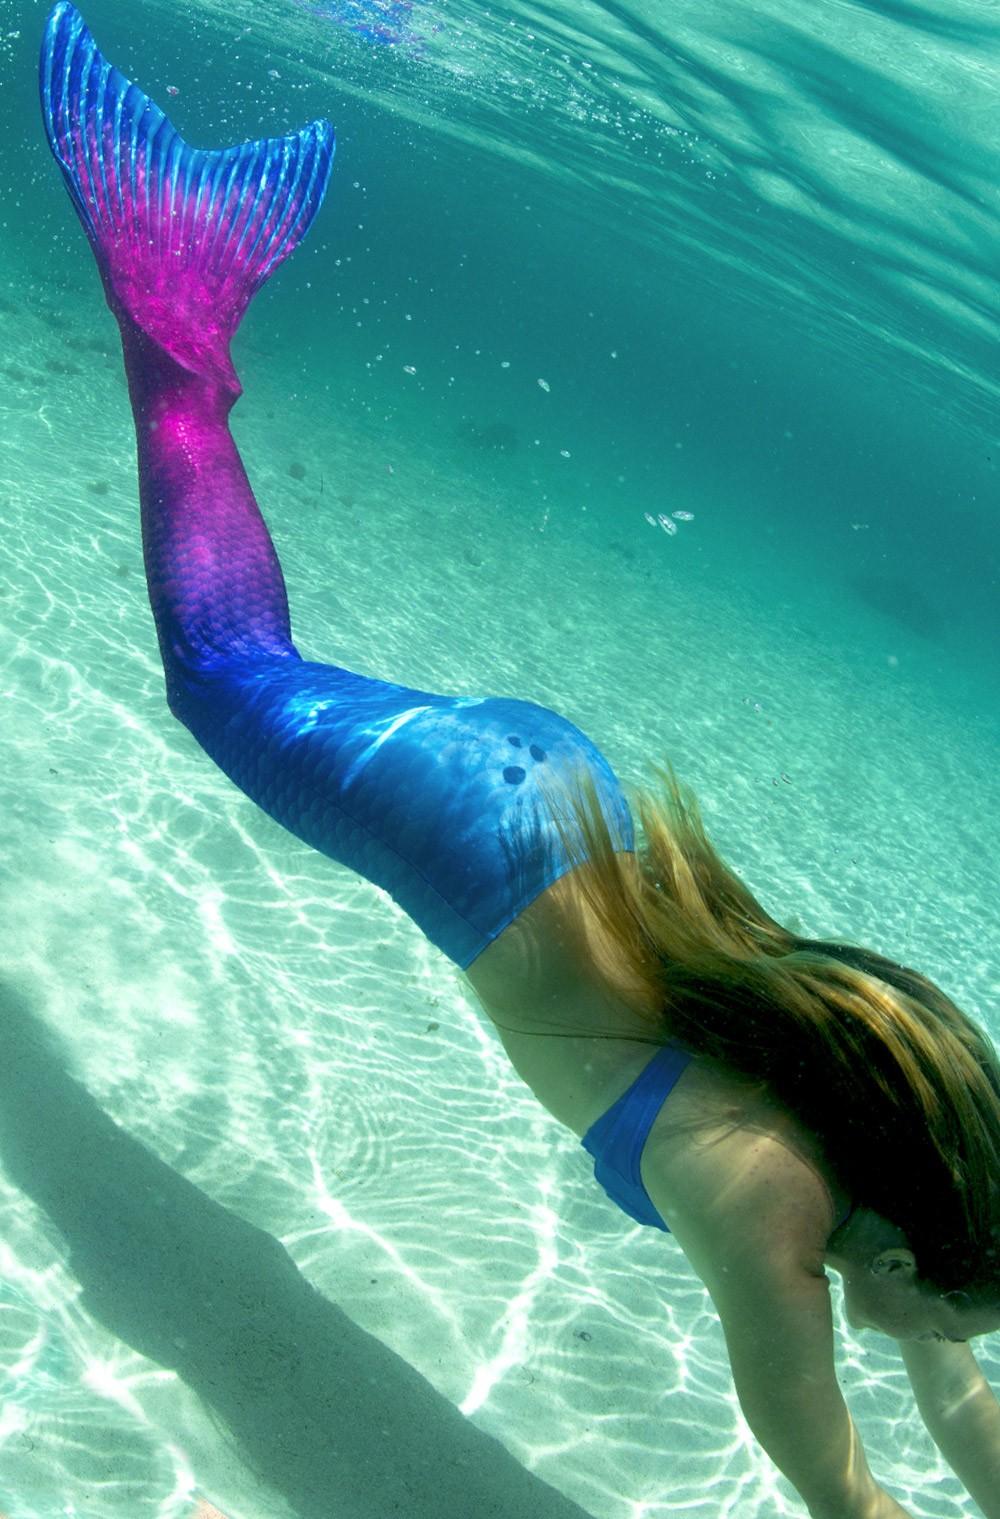 Maui Splash Mermaid Tail (Limited Edition) | FinFriends  Maui Splash Mer...